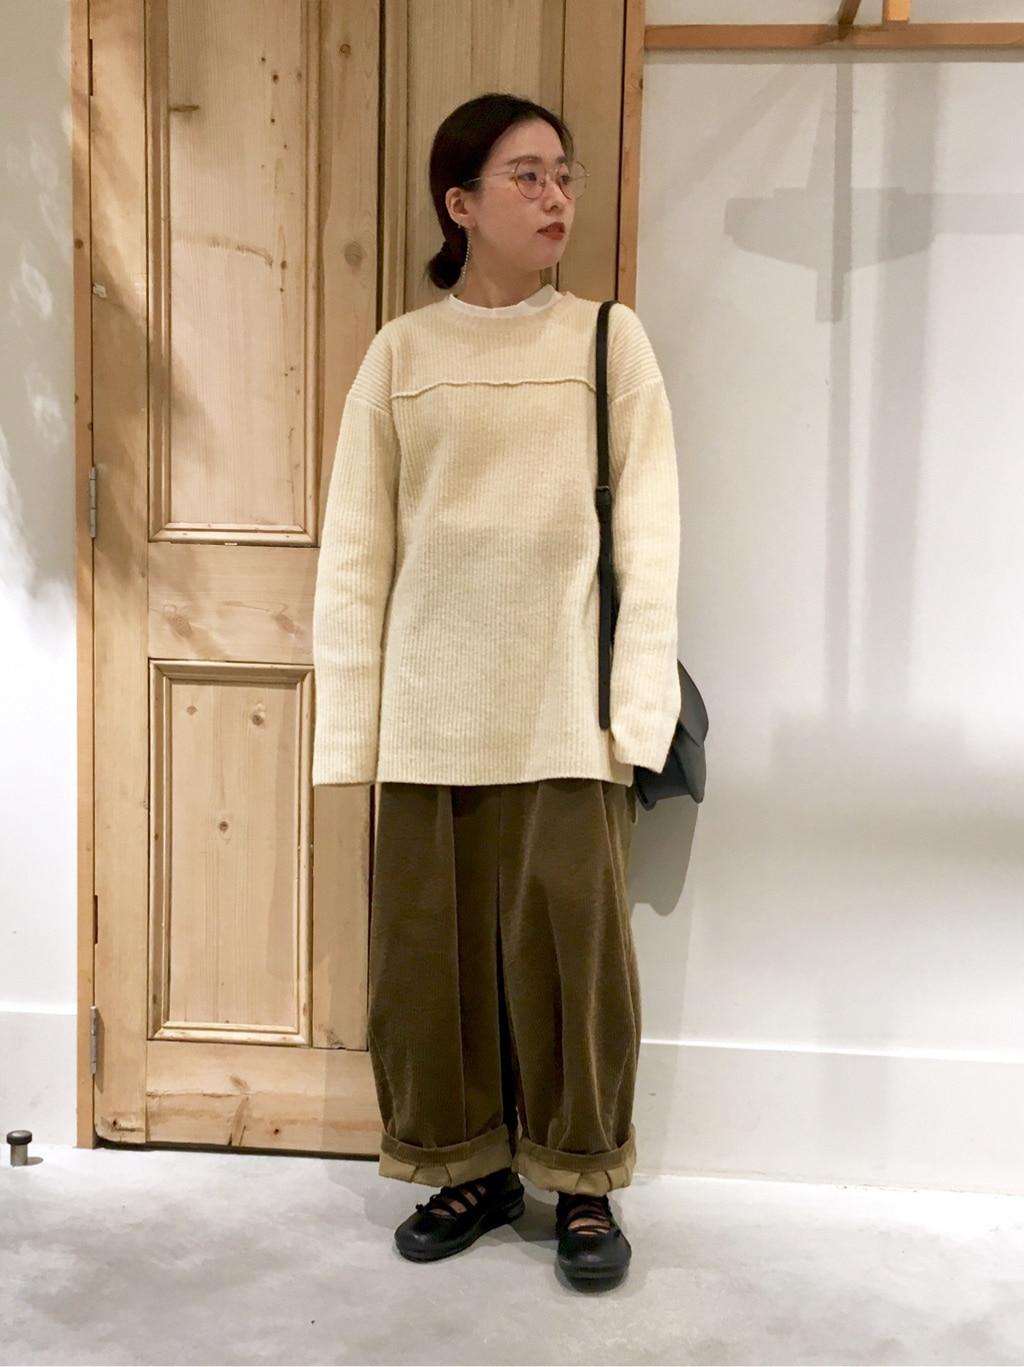 Malle chambre de charme 調布パルコ 身長:152cm 2020.10.16